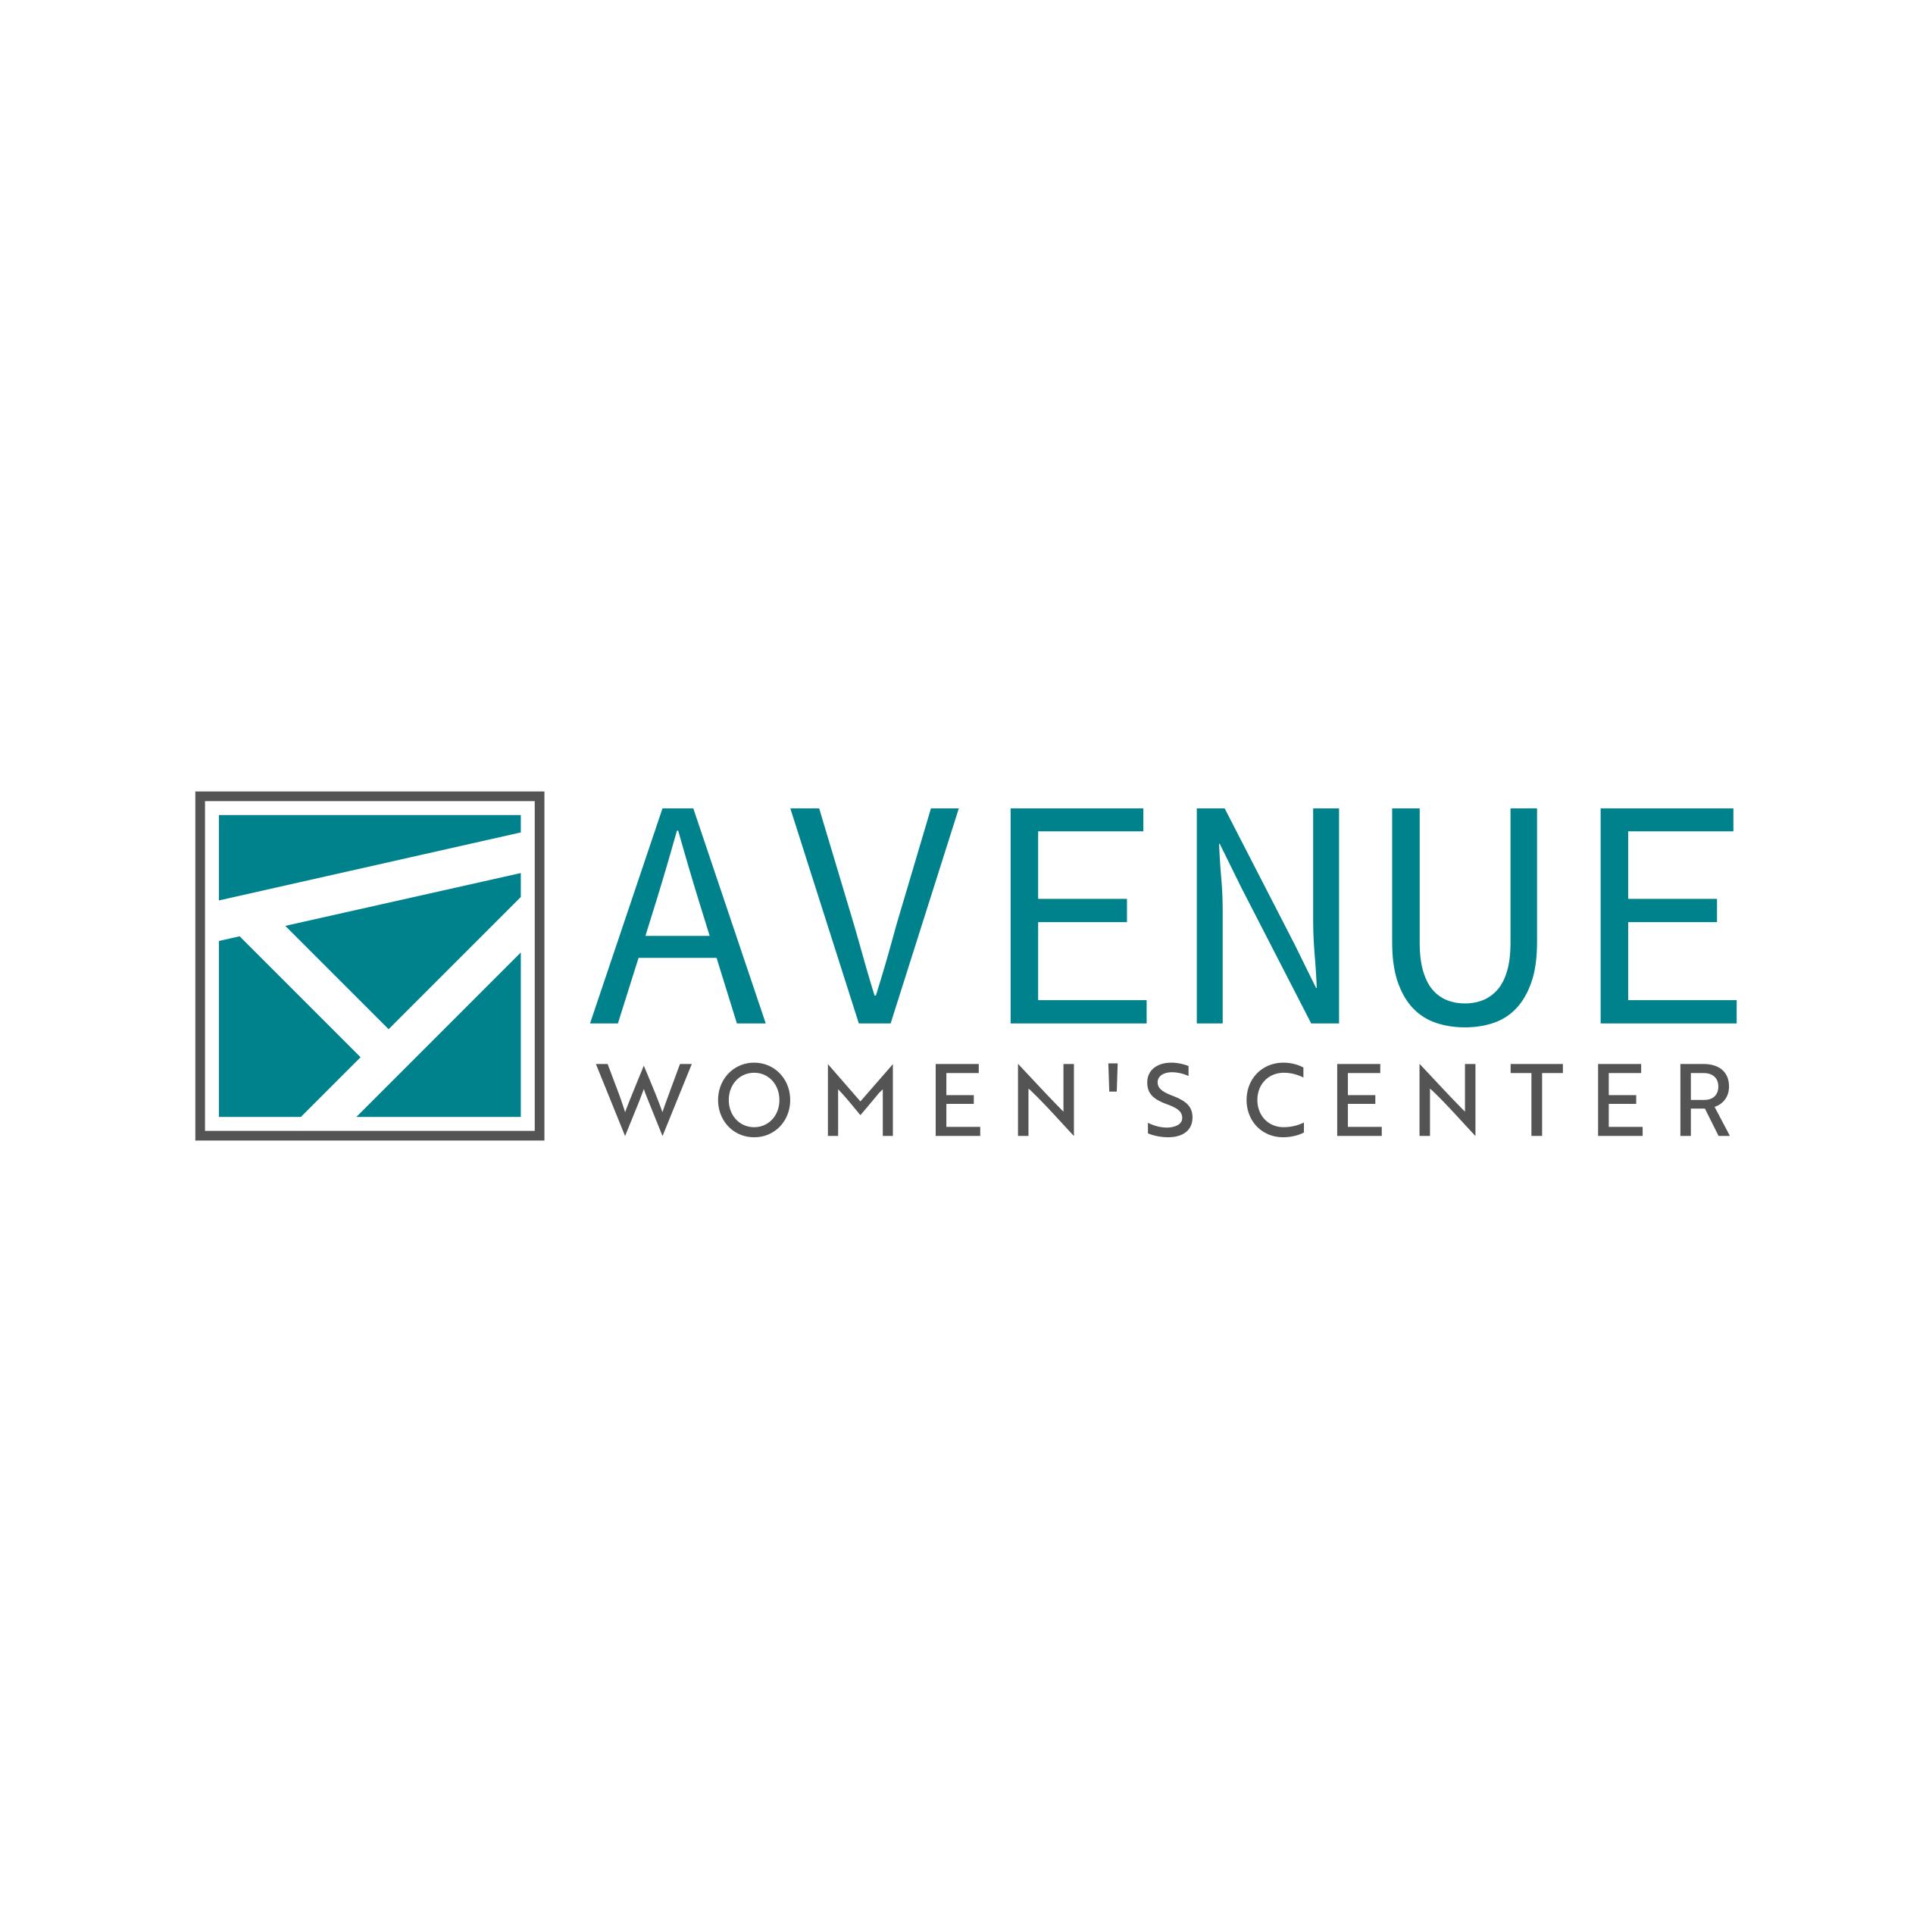 Avenue Women's Center